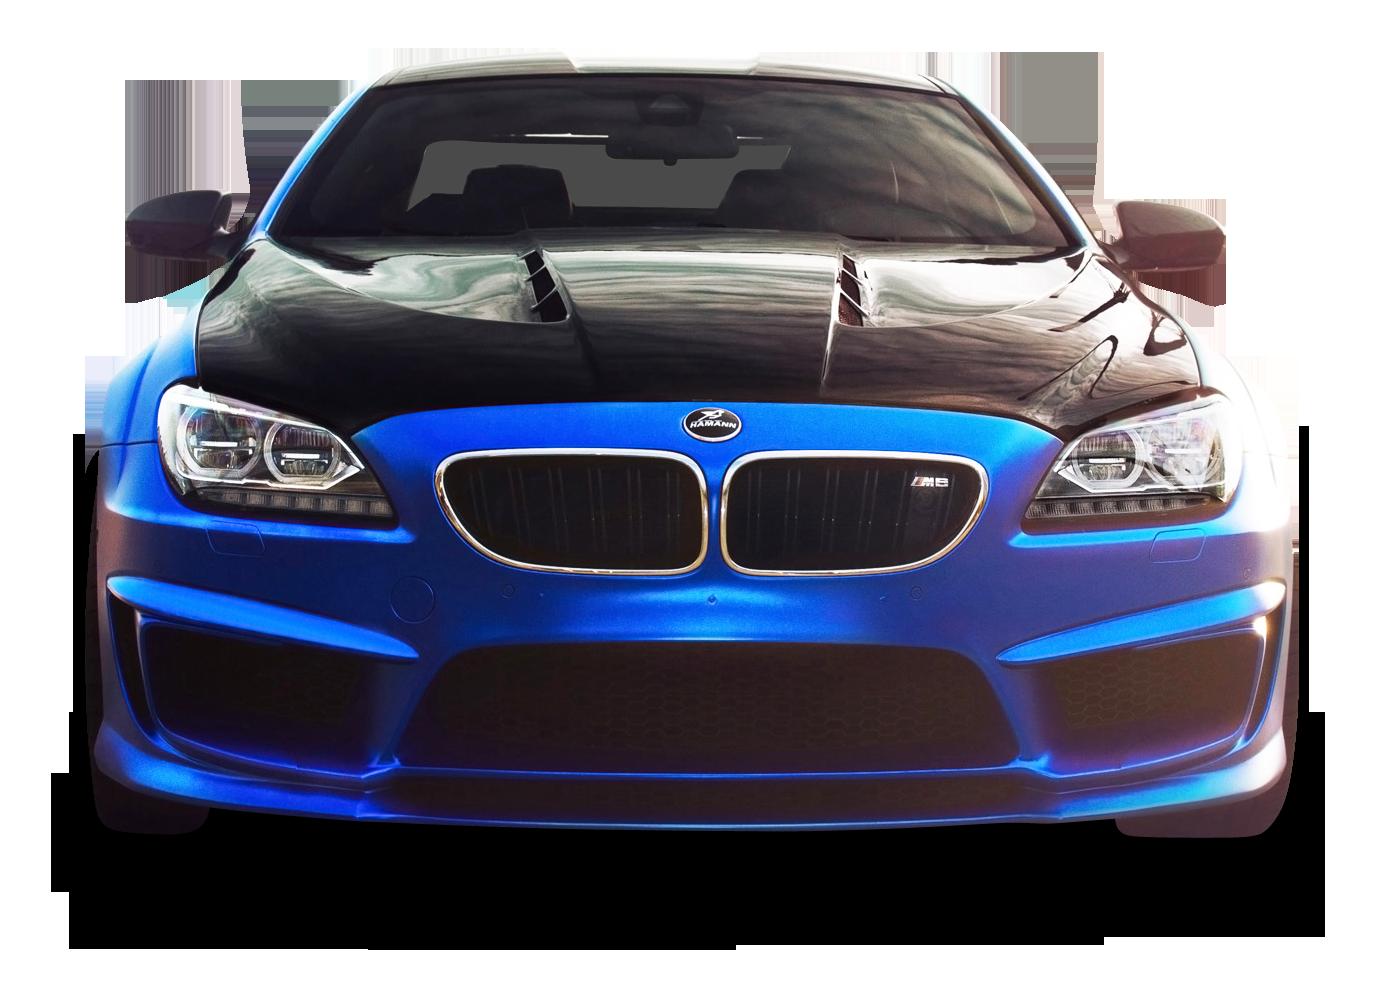 Bmw M6 Blue Car Png Image Purepng Free Transparent Cc0 Png Image